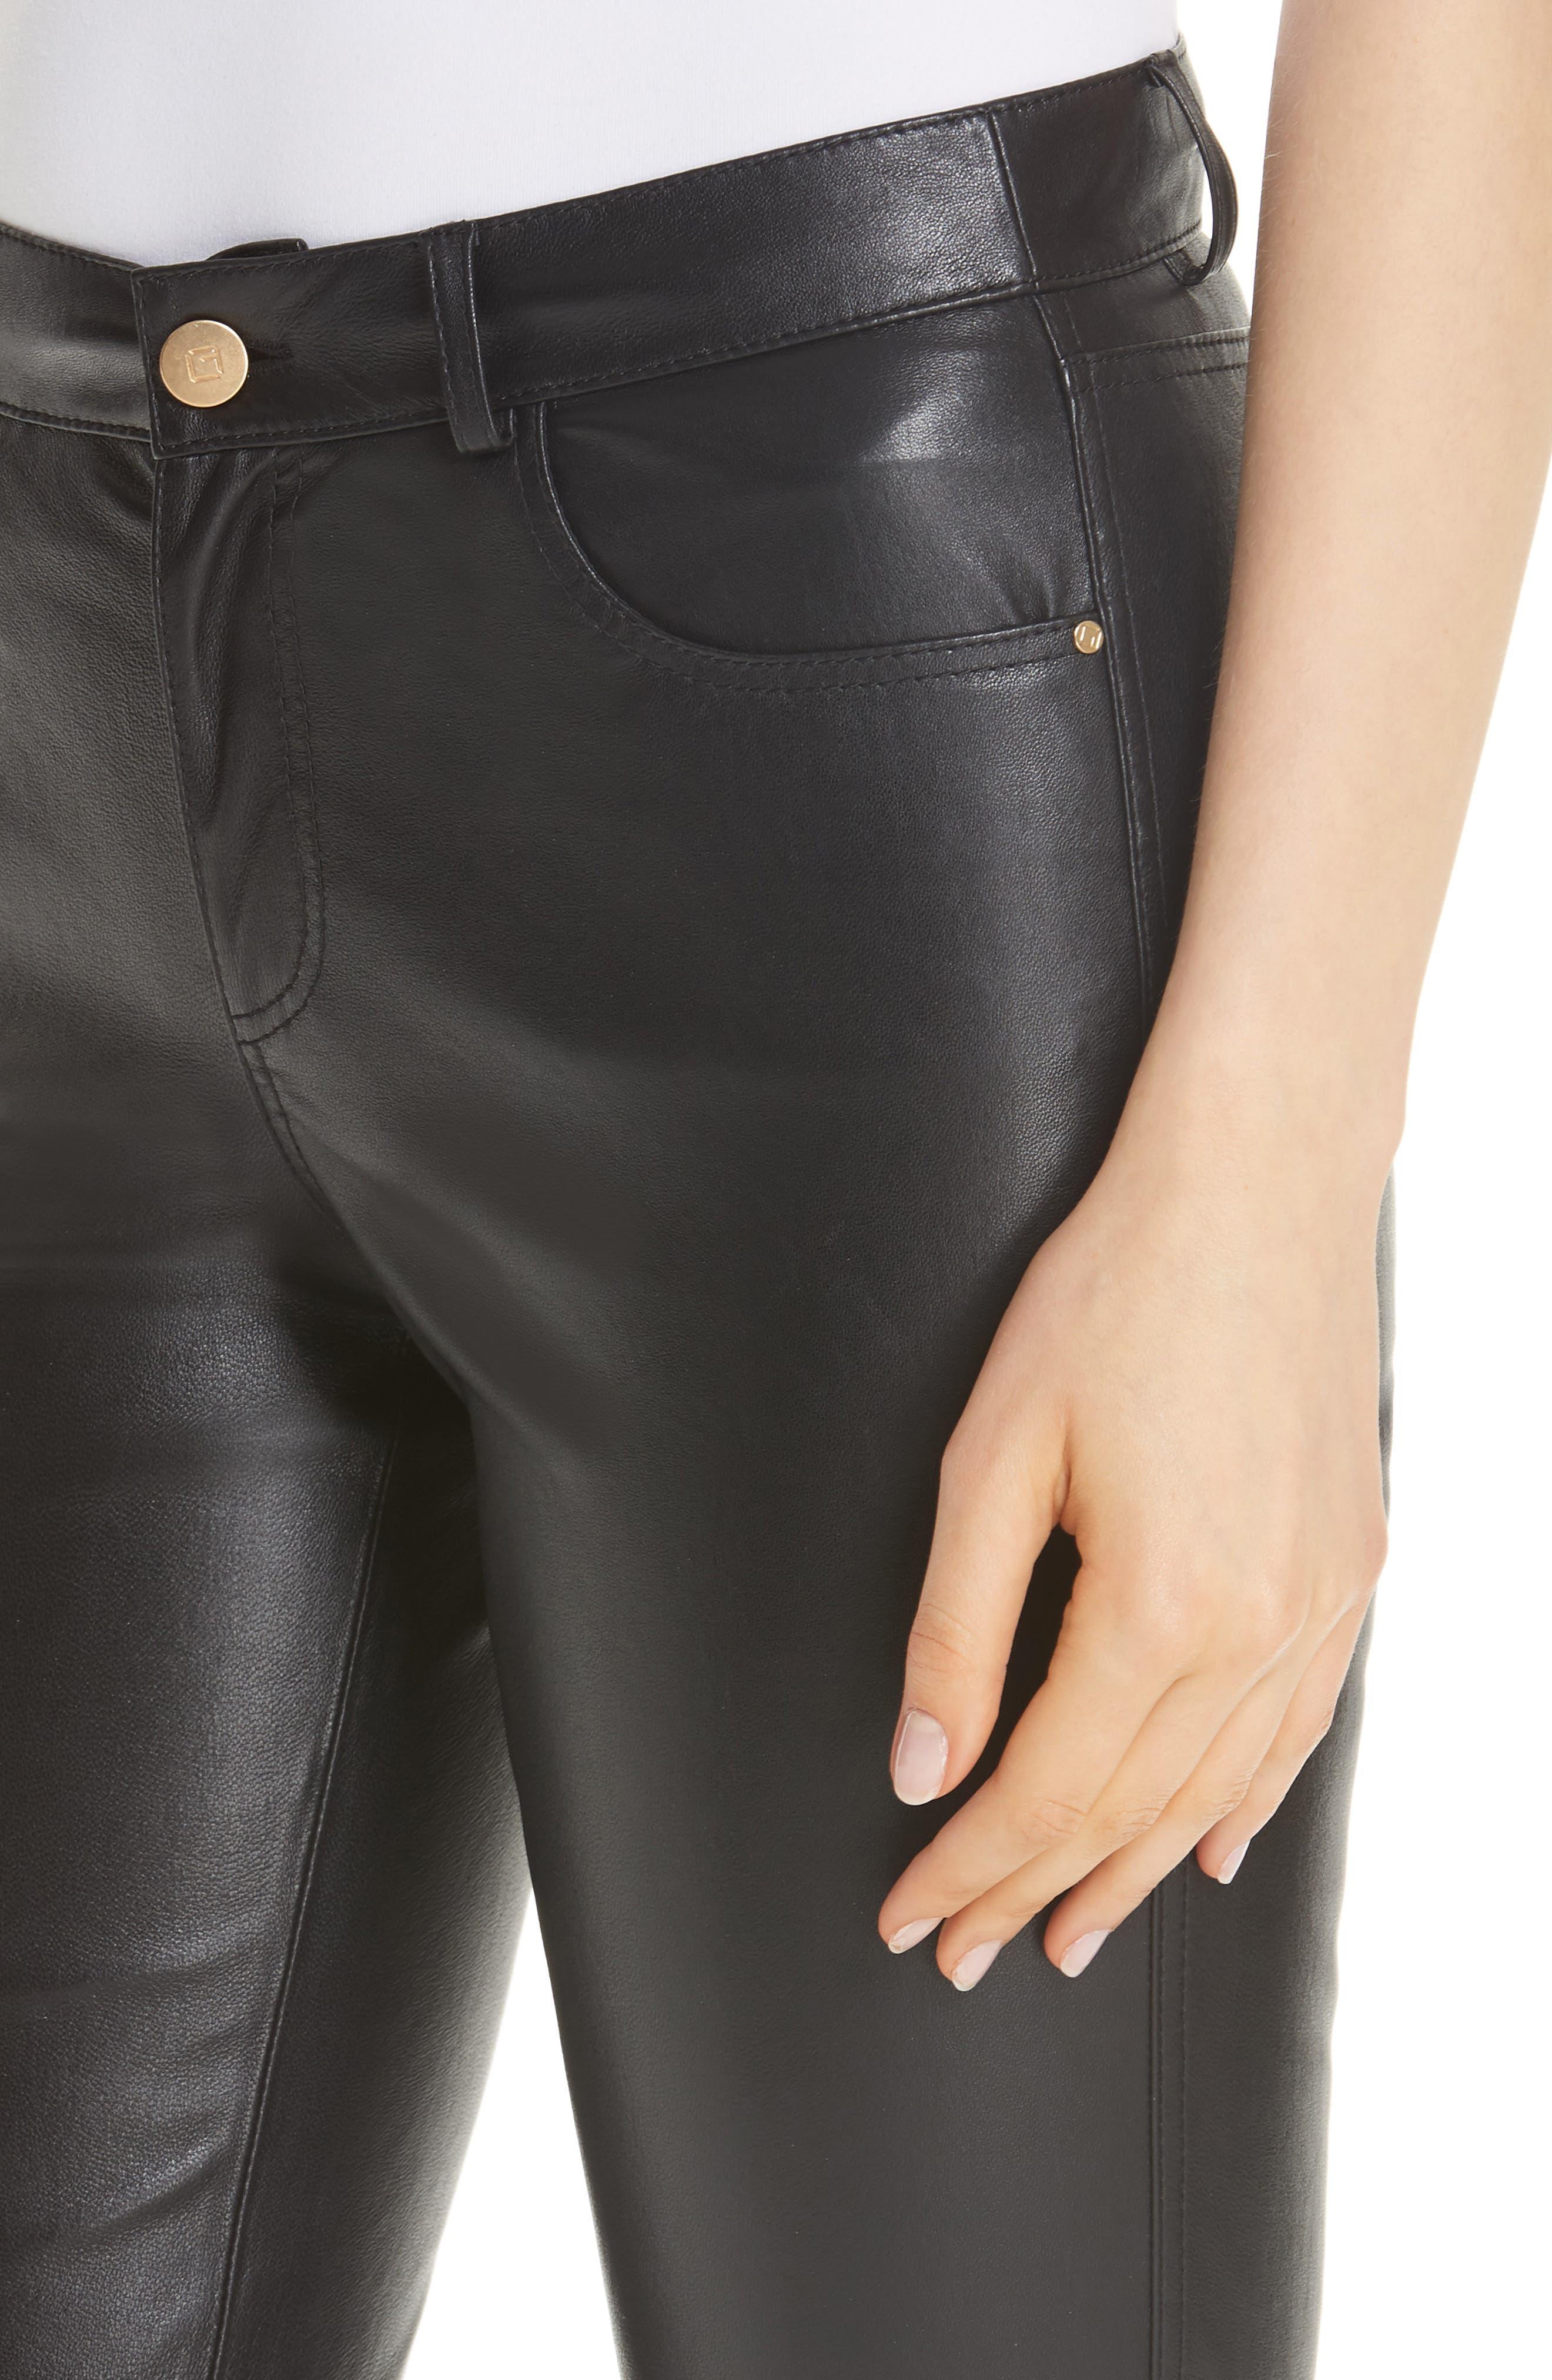 Mercer Nappa Leather Pants,                             Alternate thumbnail 4, color,                             BLACK